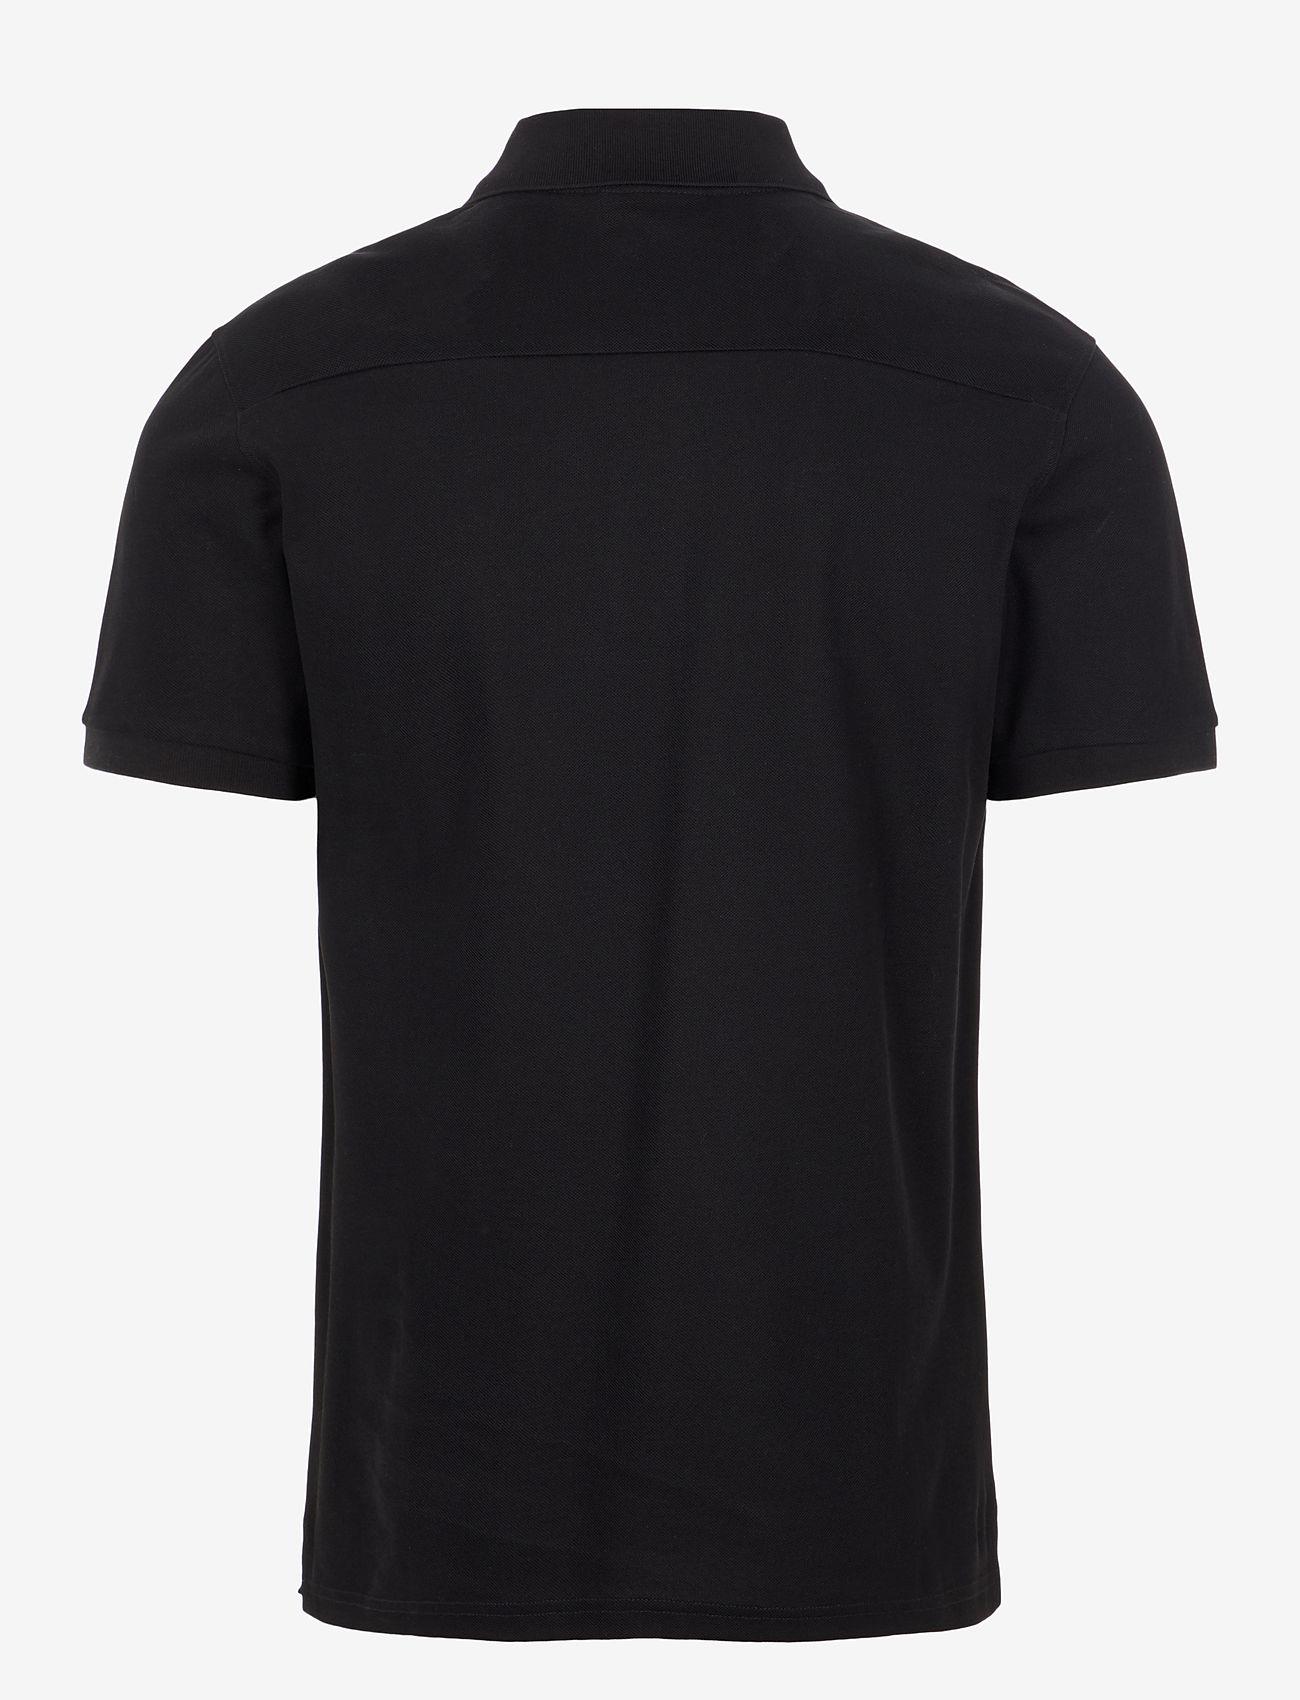 J. Lindeberg - Troy ST Pique Polo Shirt - kurzärmelig - black - 1